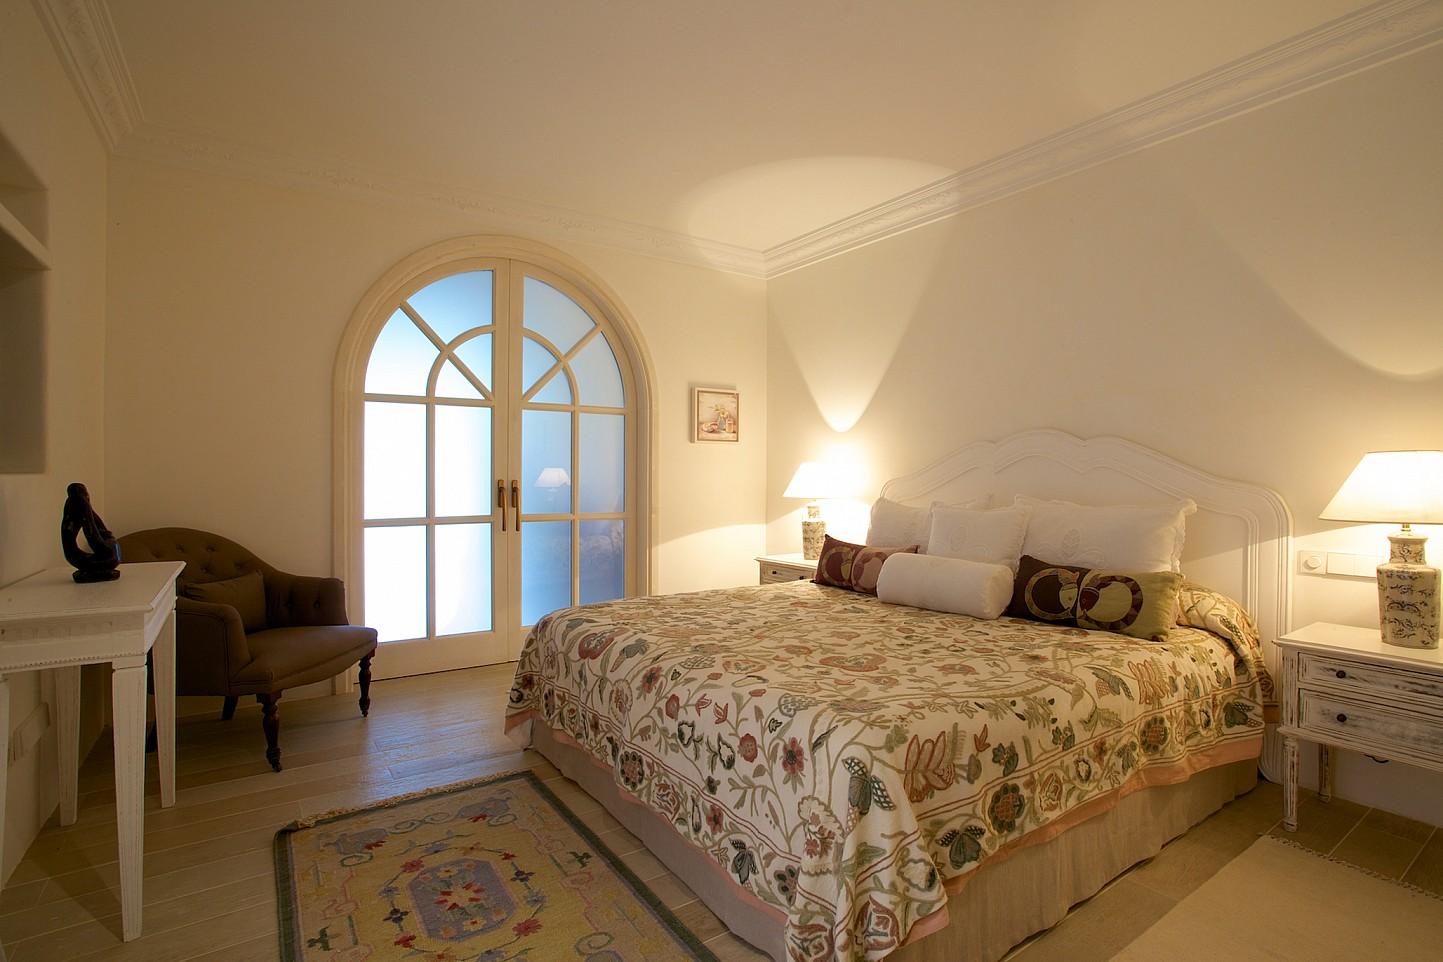 Dormitori ampli ben il.luminat